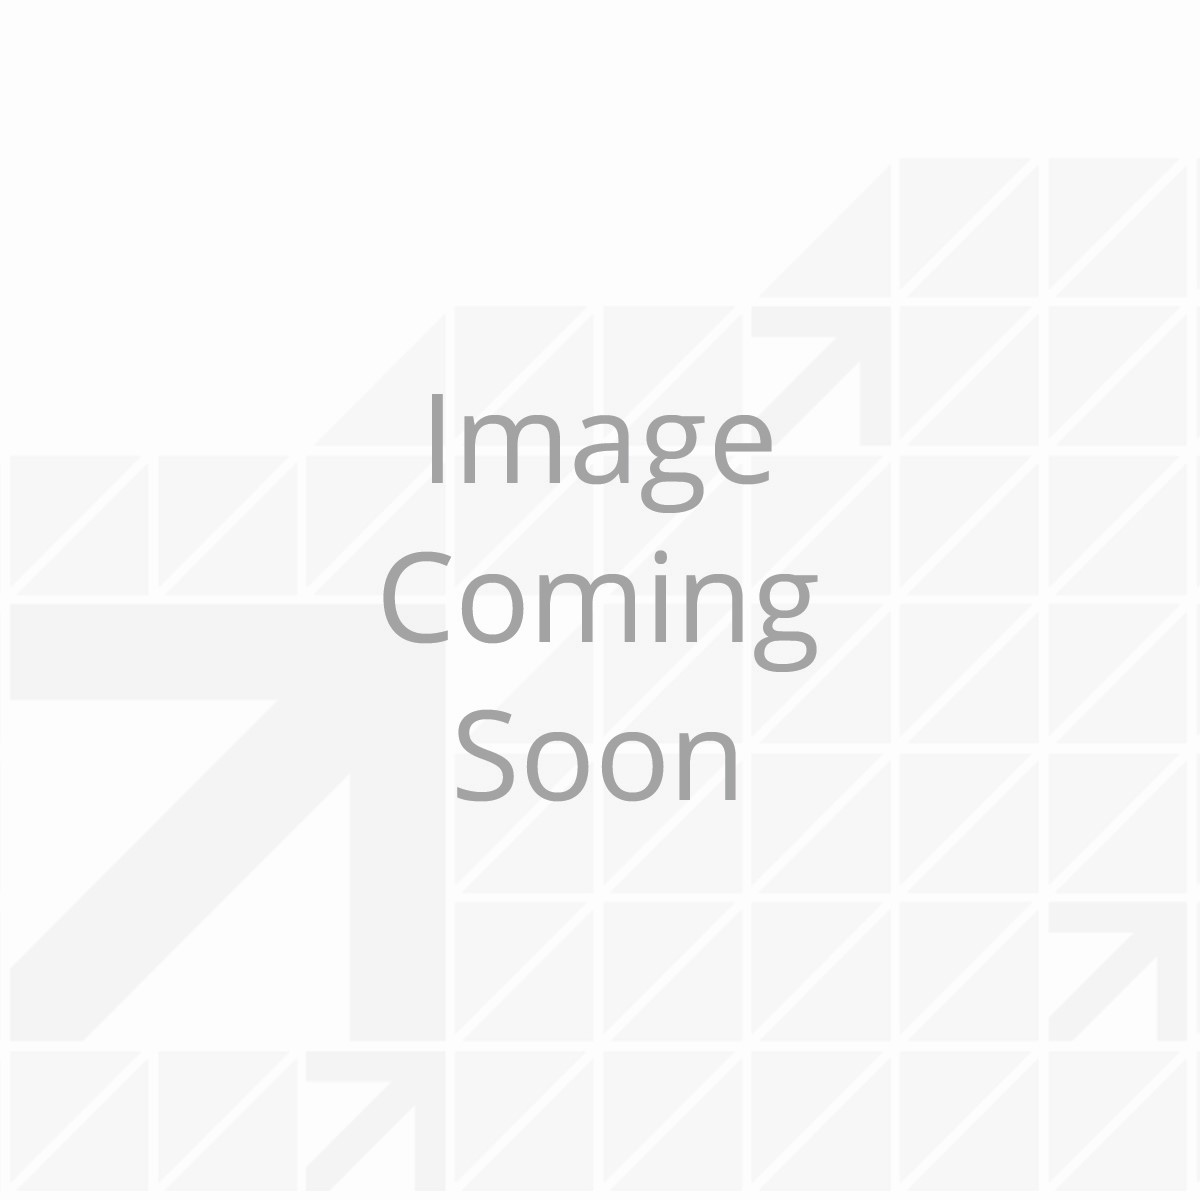 Shock Bracket (Weld-on) - Various Sizes